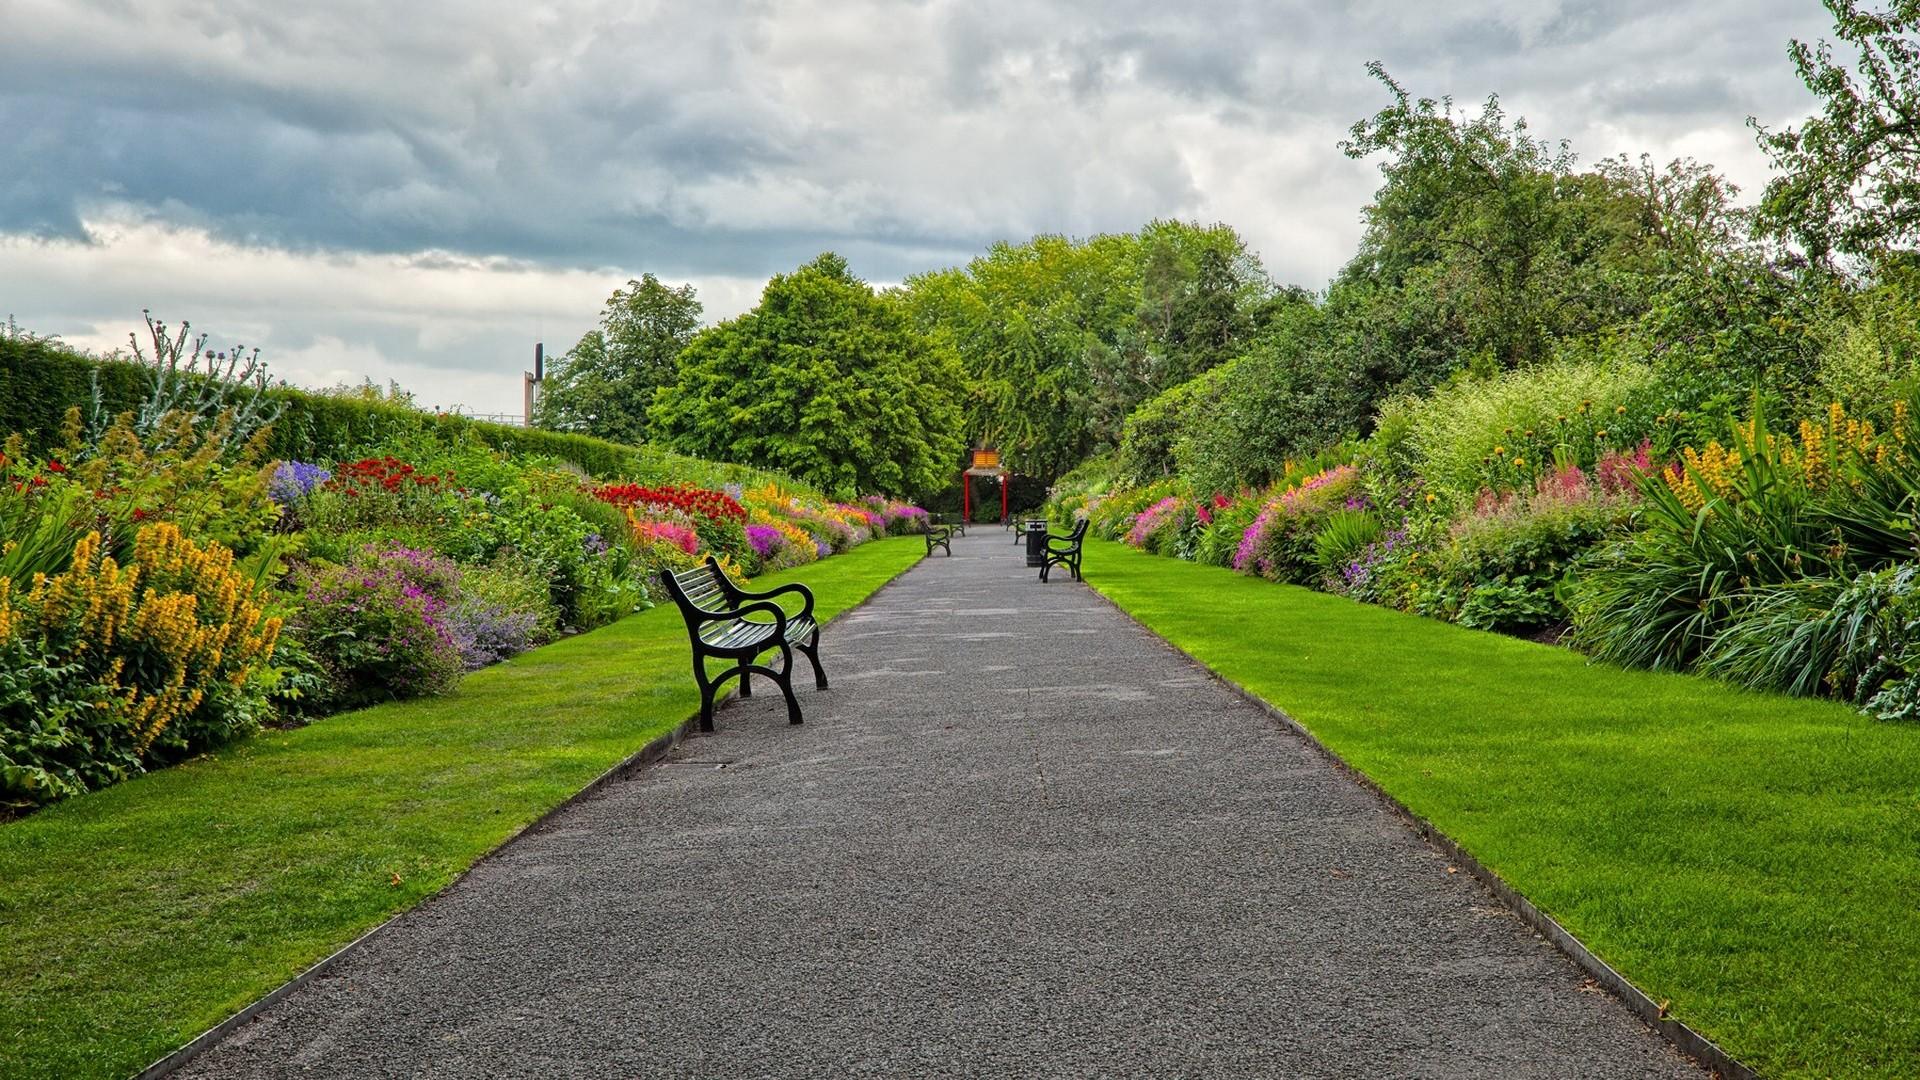 Preview wallpaper garden, park, road, benches, landscape 1920×1080